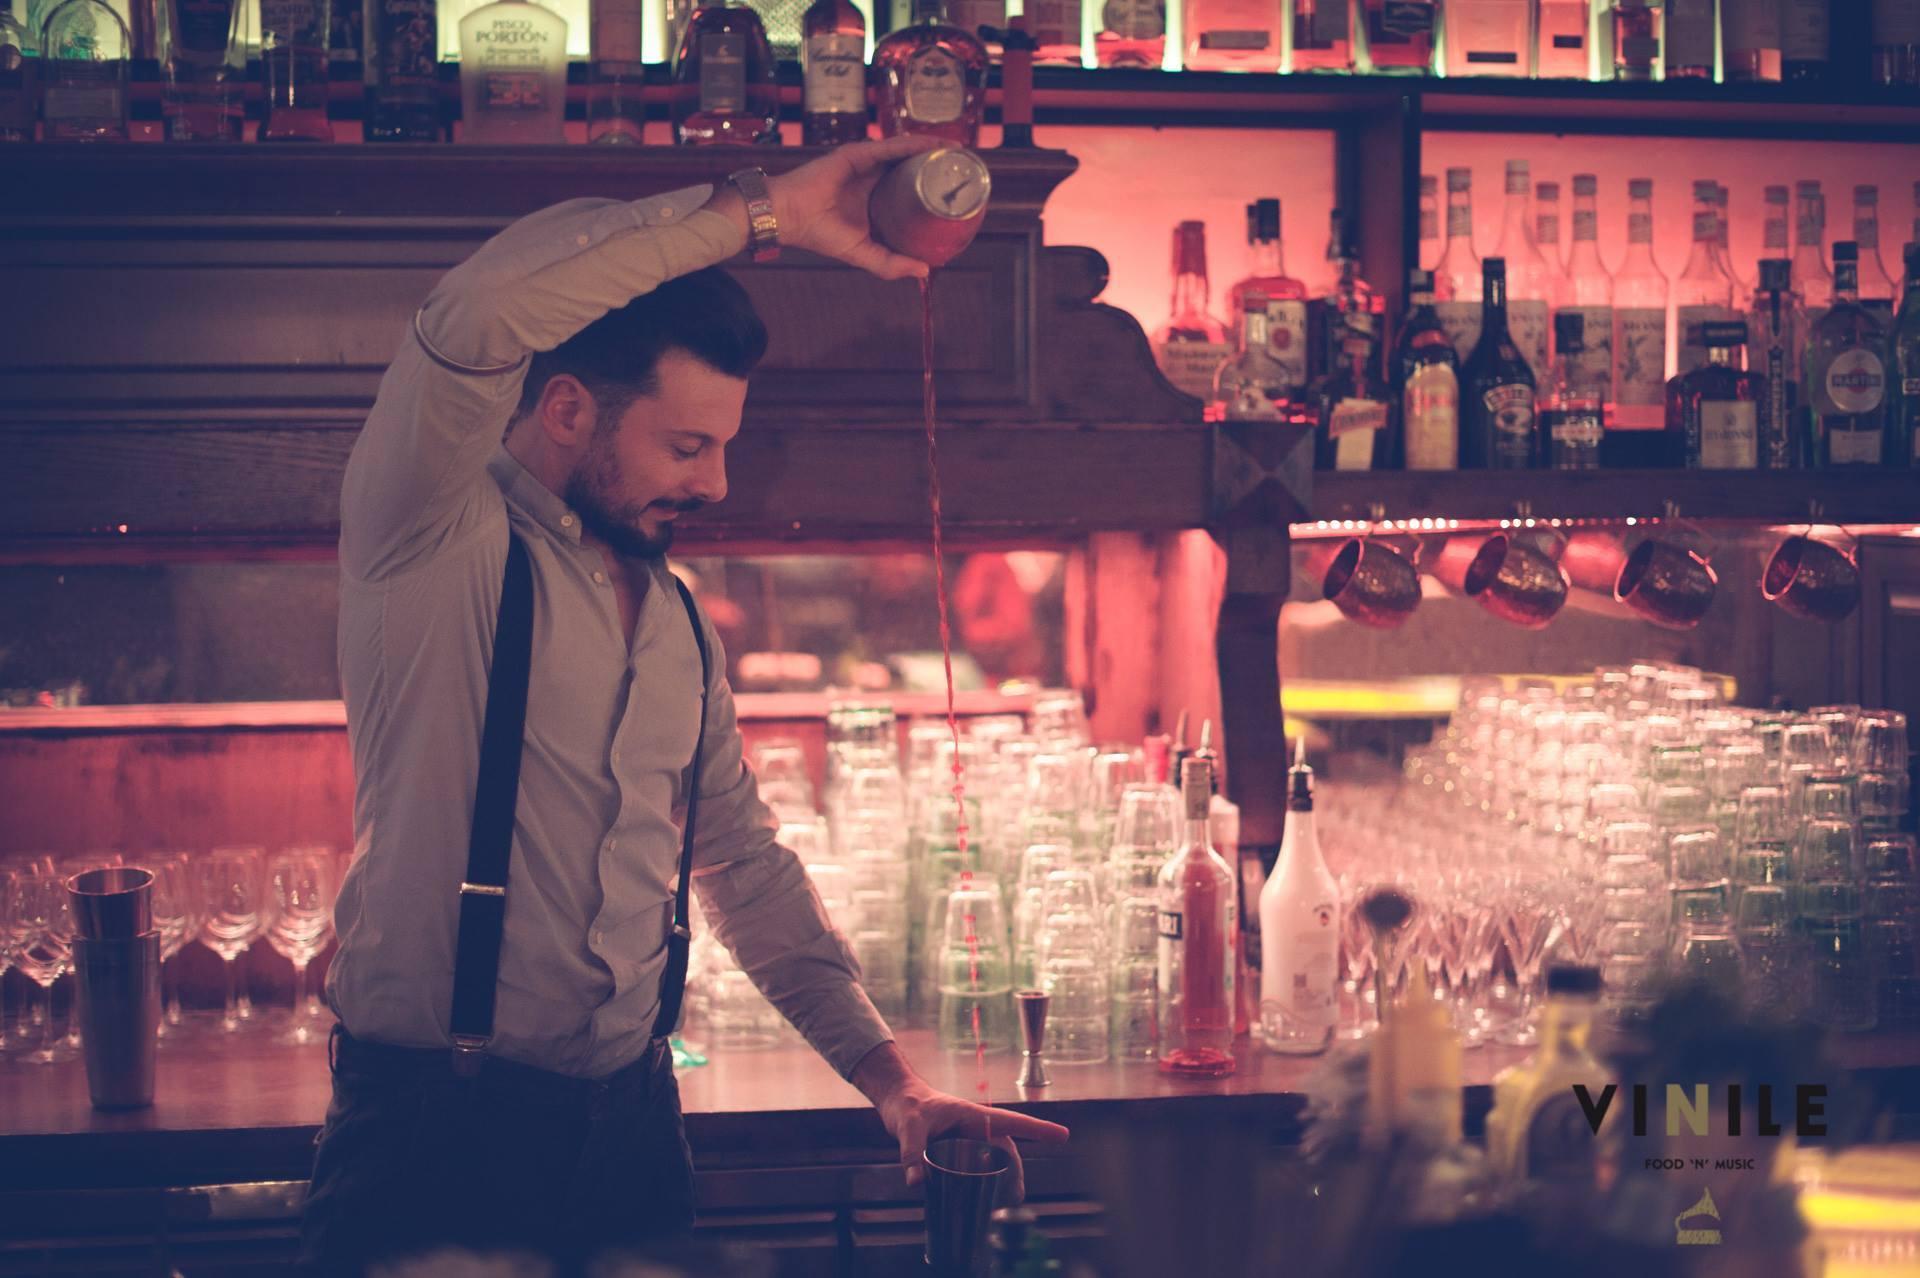 Flirt club rome italy